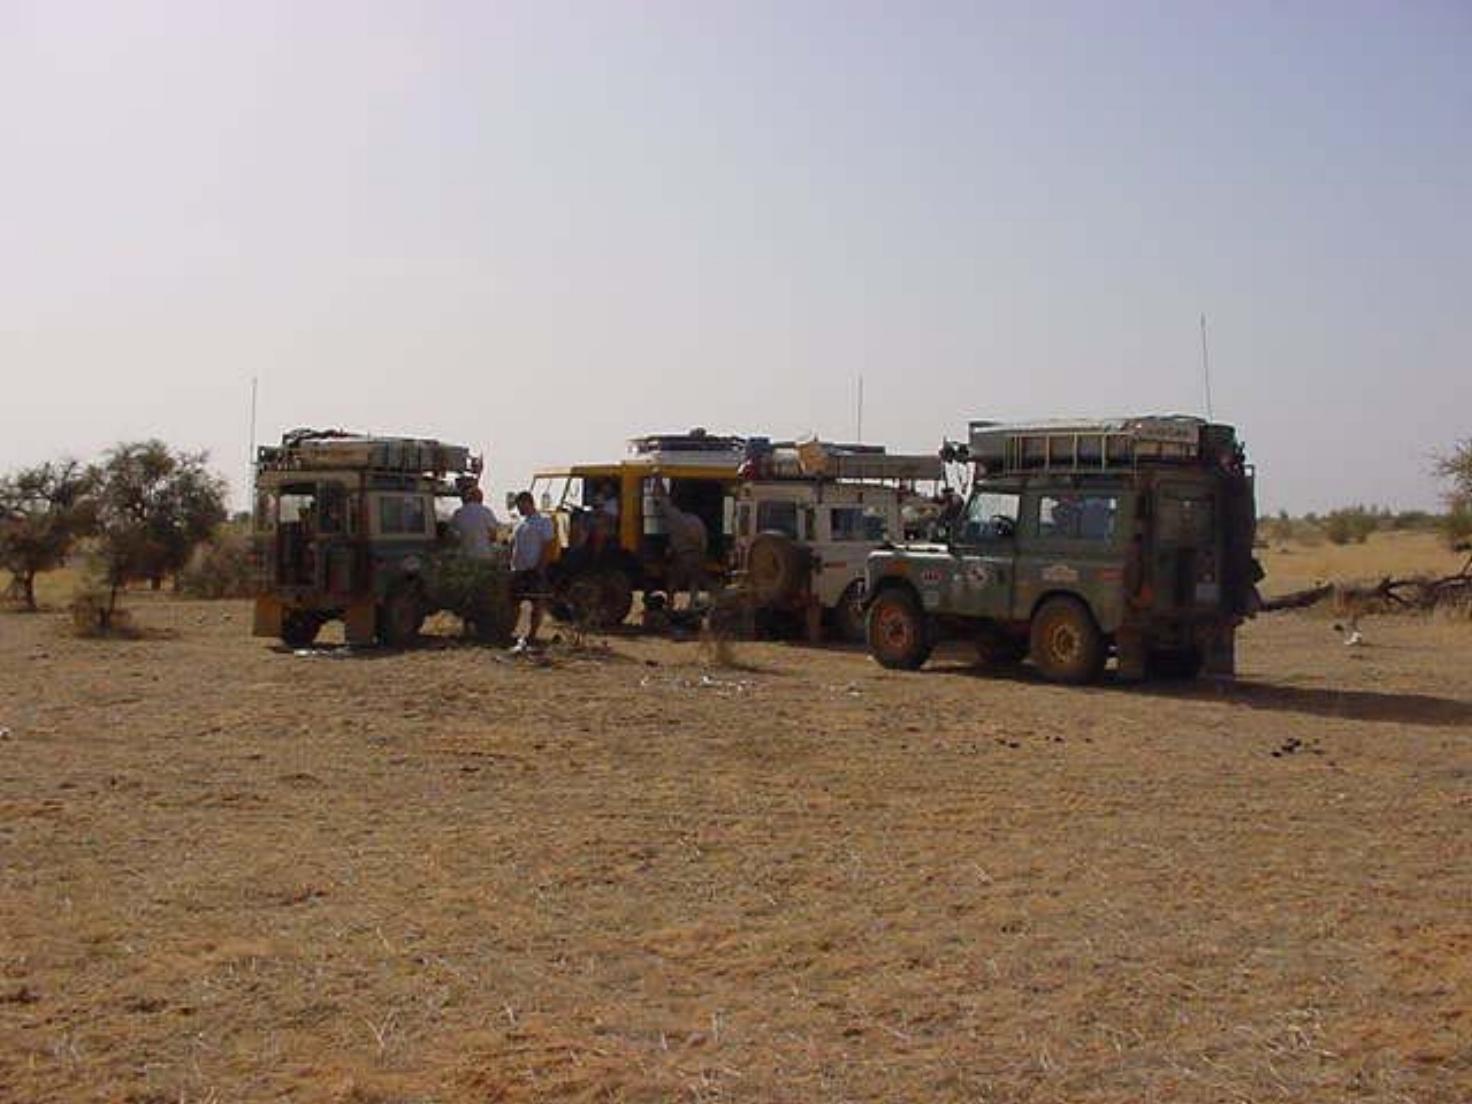 Sahara Desert camping